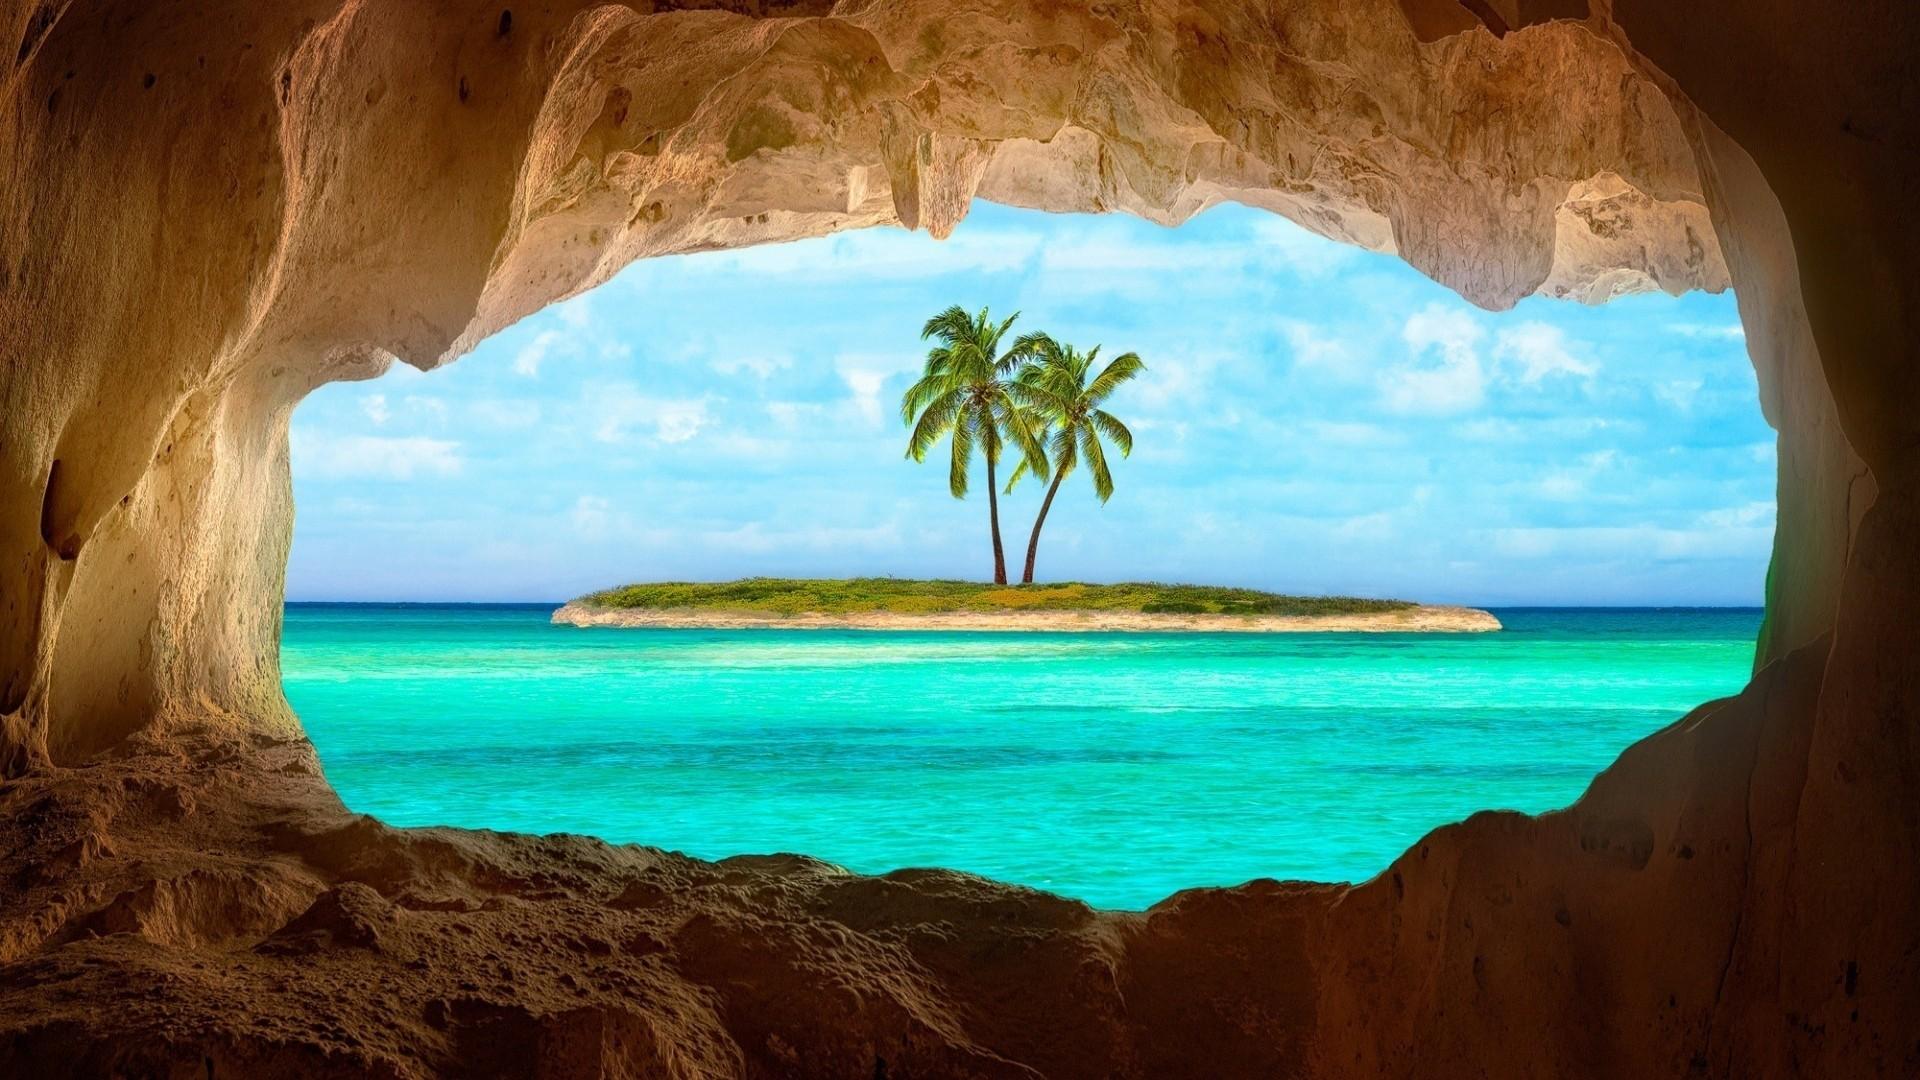 General 1920x1080 island Caribbean cave palm trees sea turquoise rock horizon